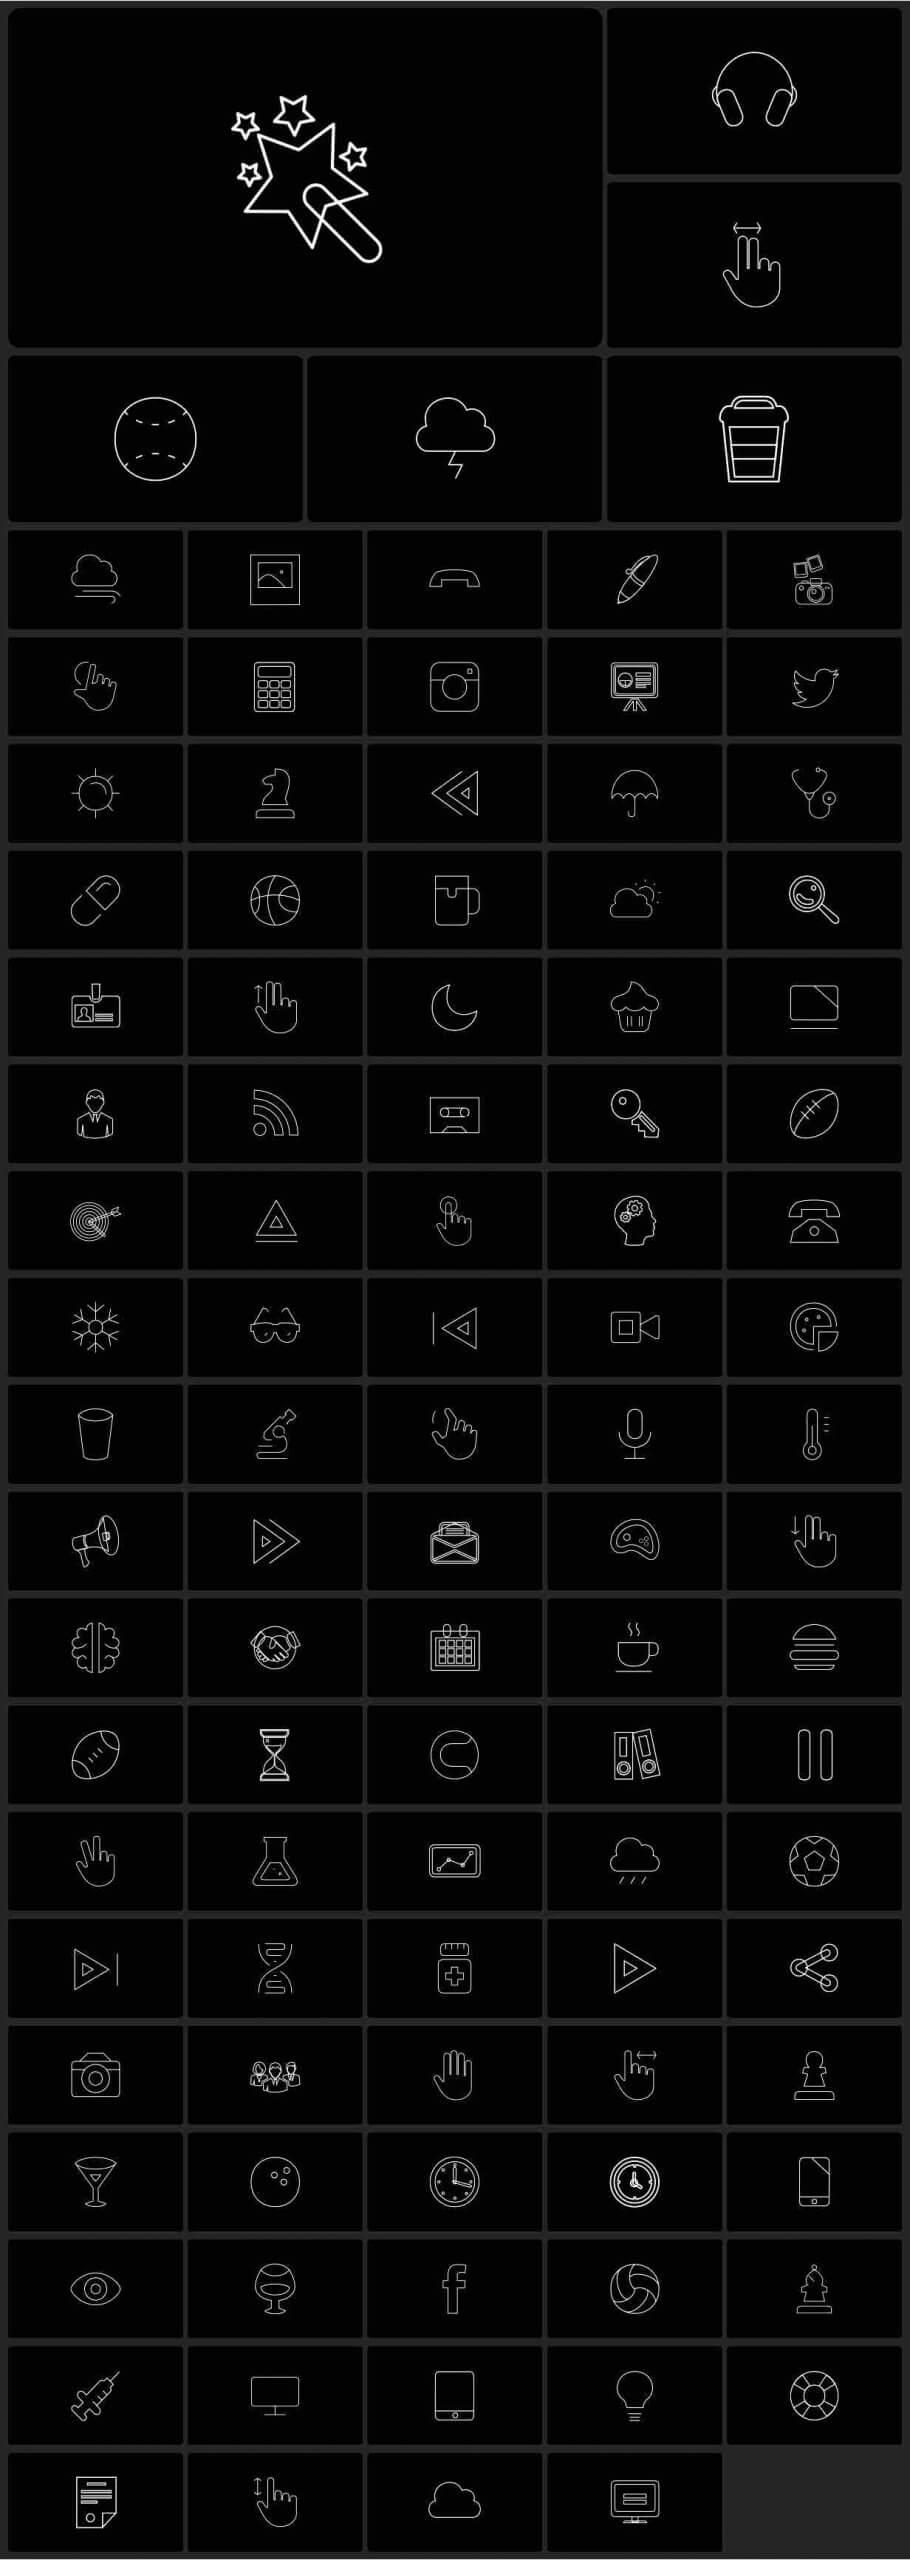 AE模板-2200+效果工具图形库 Graphics Pack插图23